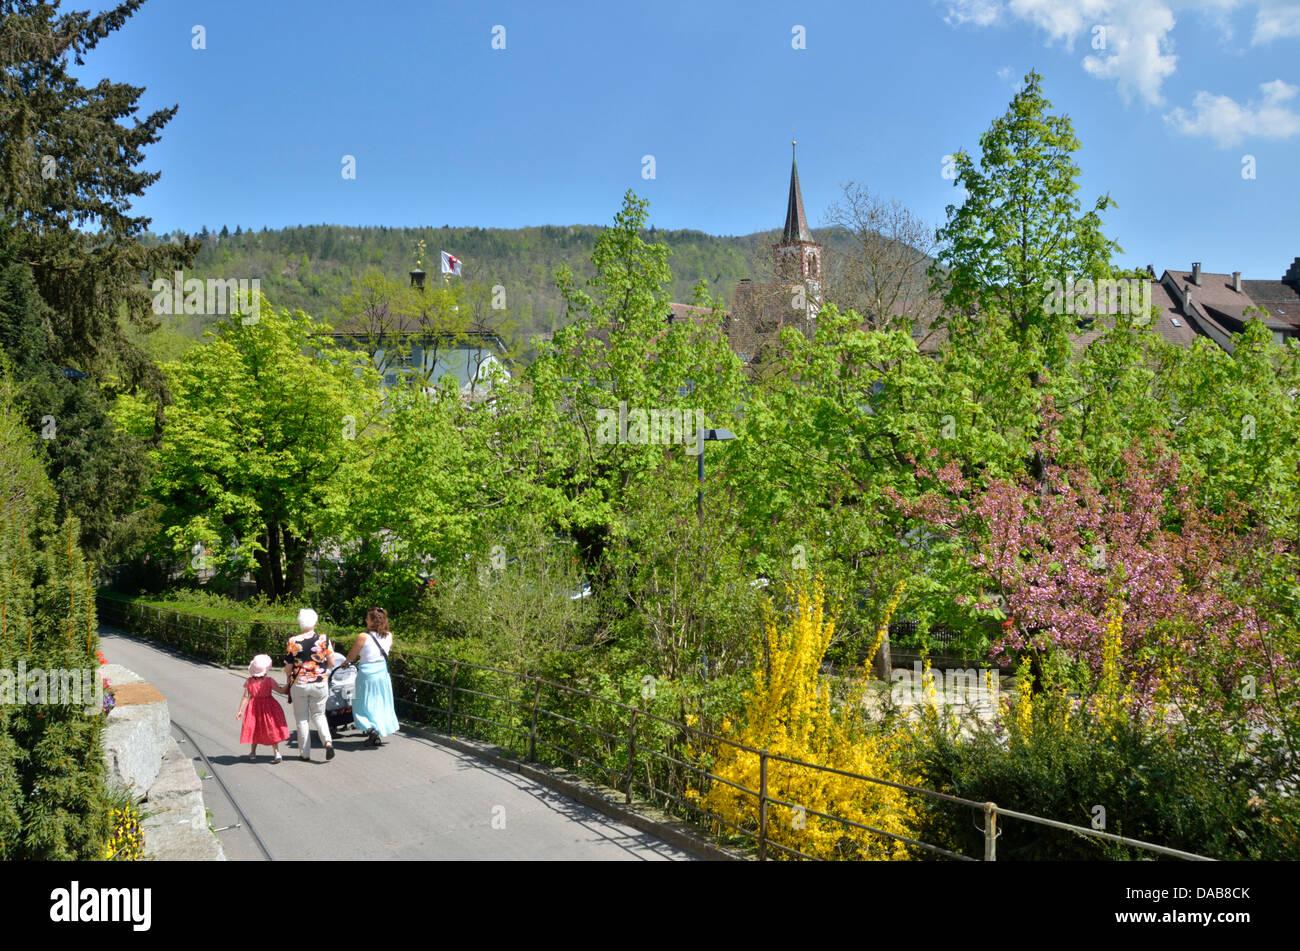 Liestal, Basel-Landschaft, Switzerland. - Stock Image